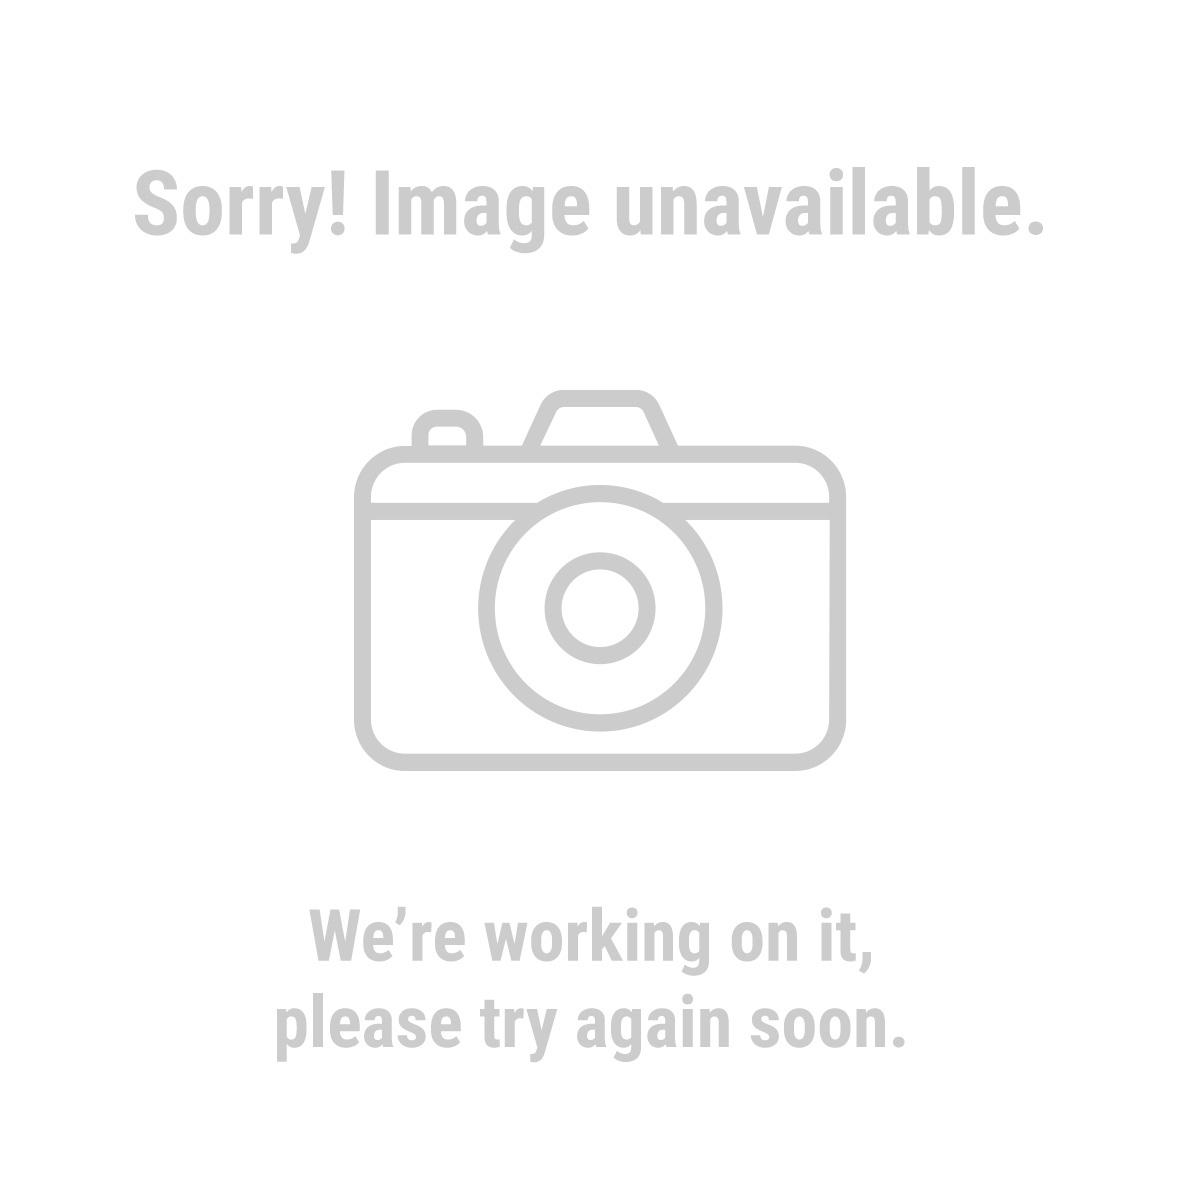 52 Pocket Bucket Organizer